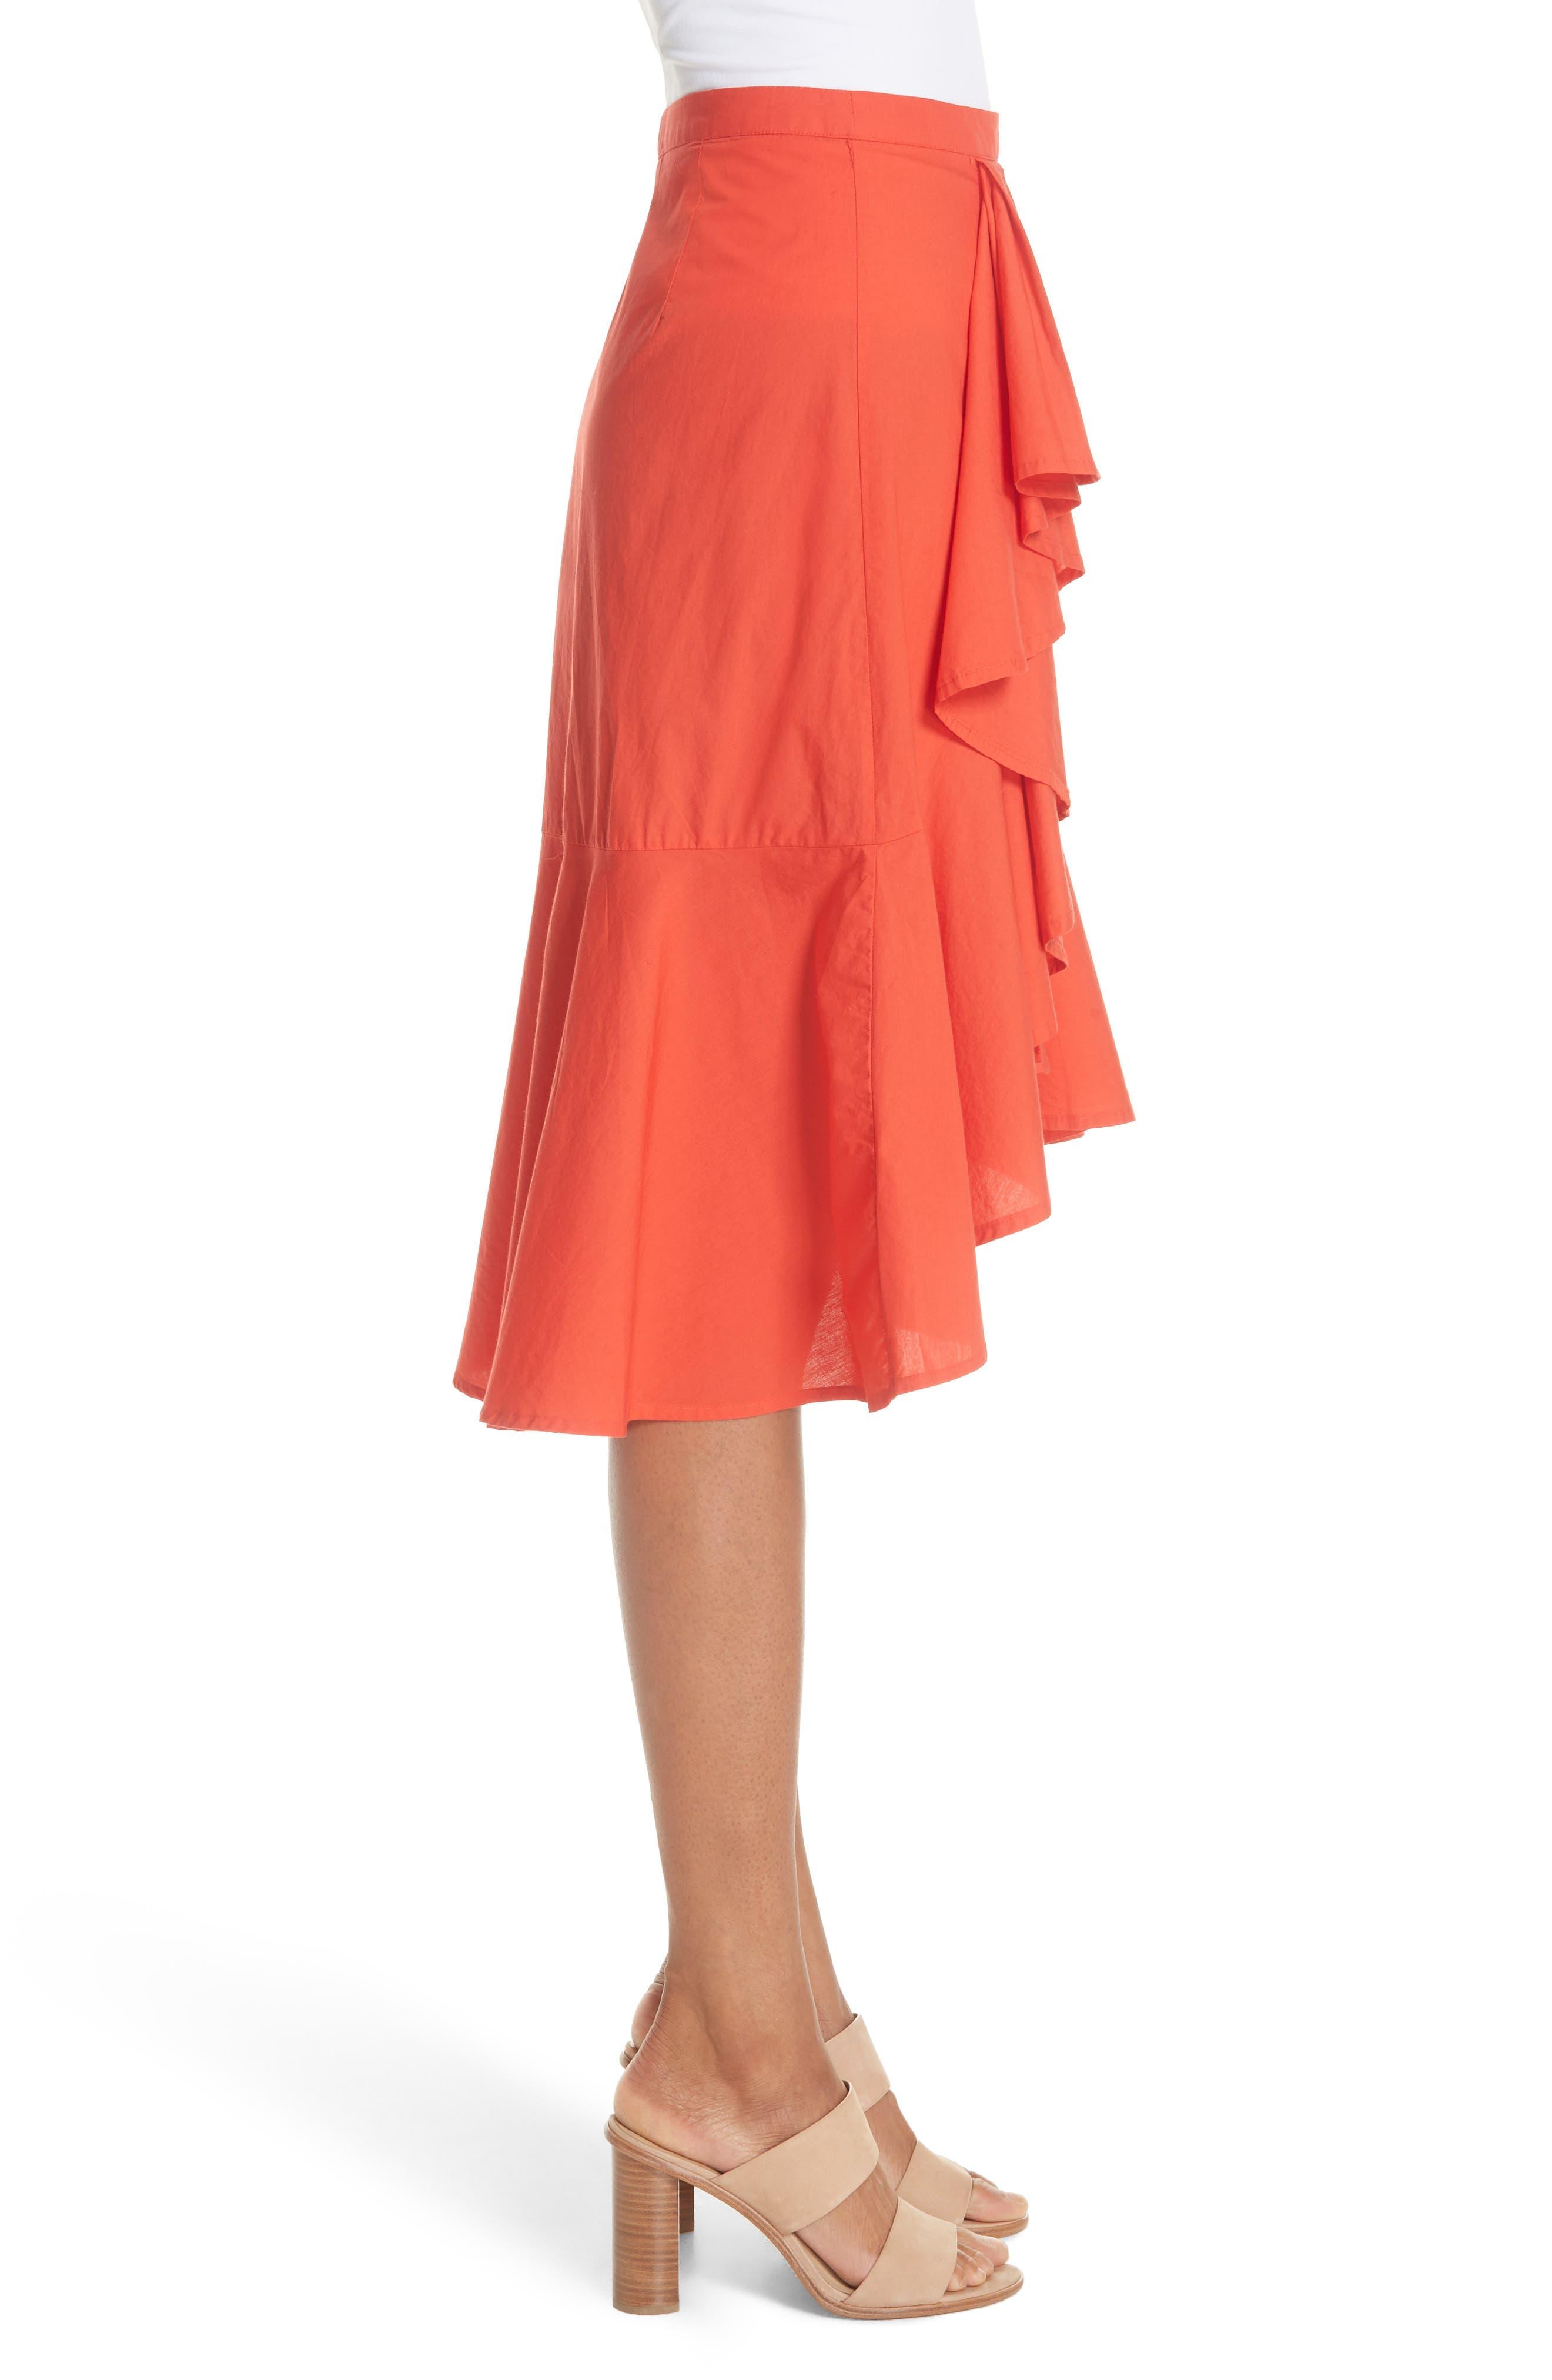 Chesmu Ruffled Cotton Skirt,                             Alternate thumbnail 6, color,